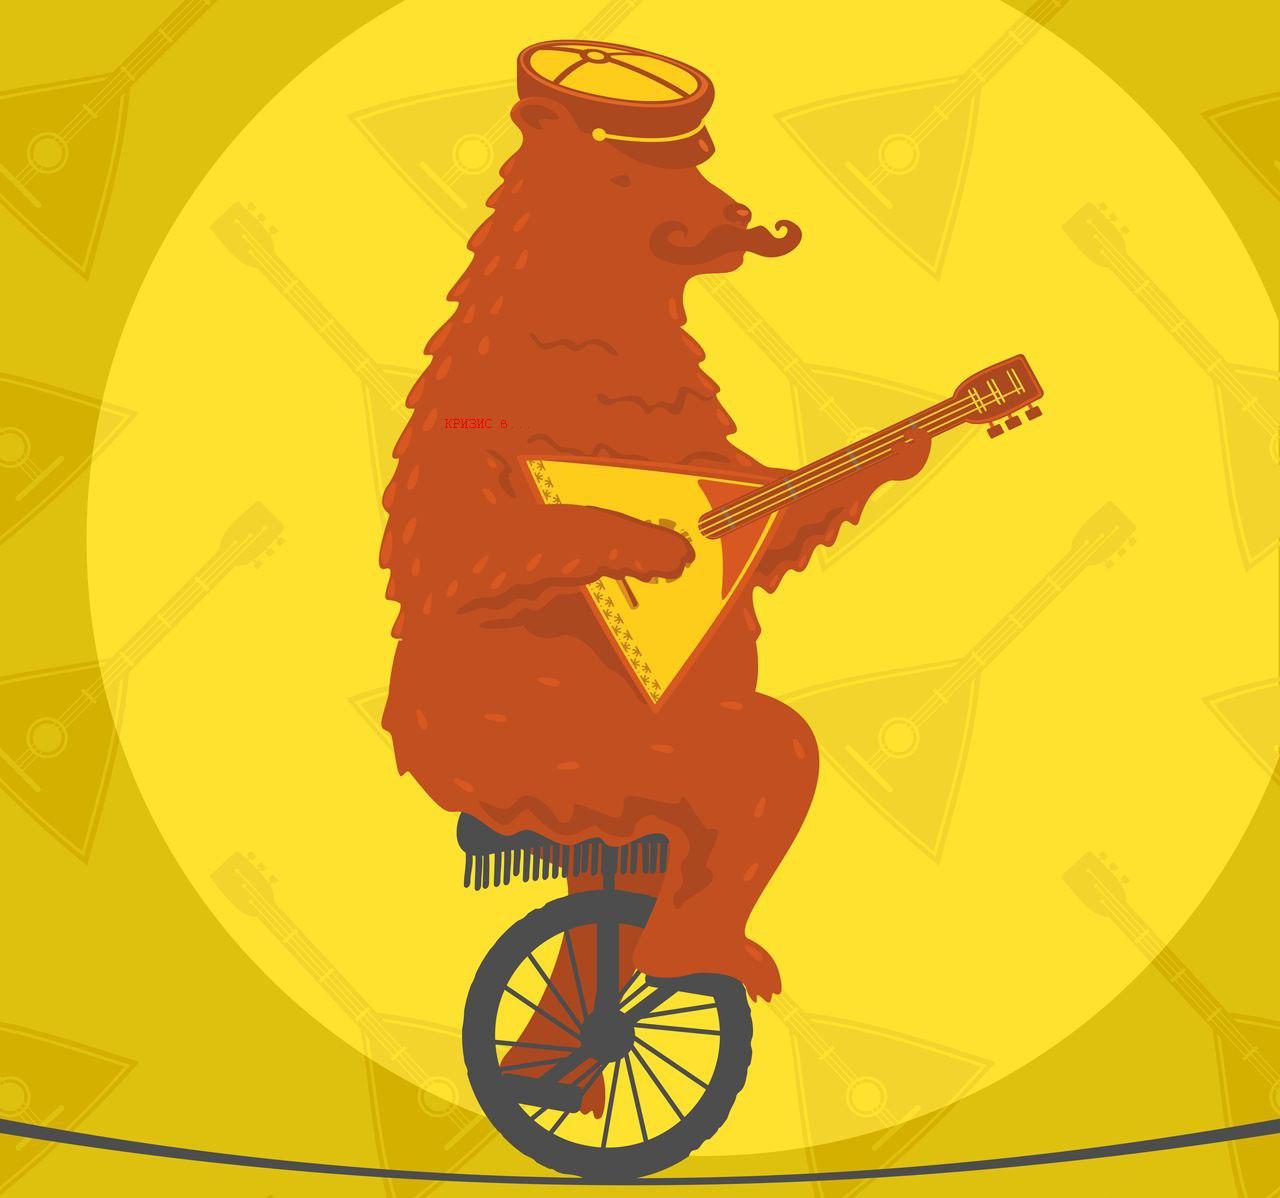 семи игл картинки афиш медведей на мотоциклах сомневается, рожайте спокойно